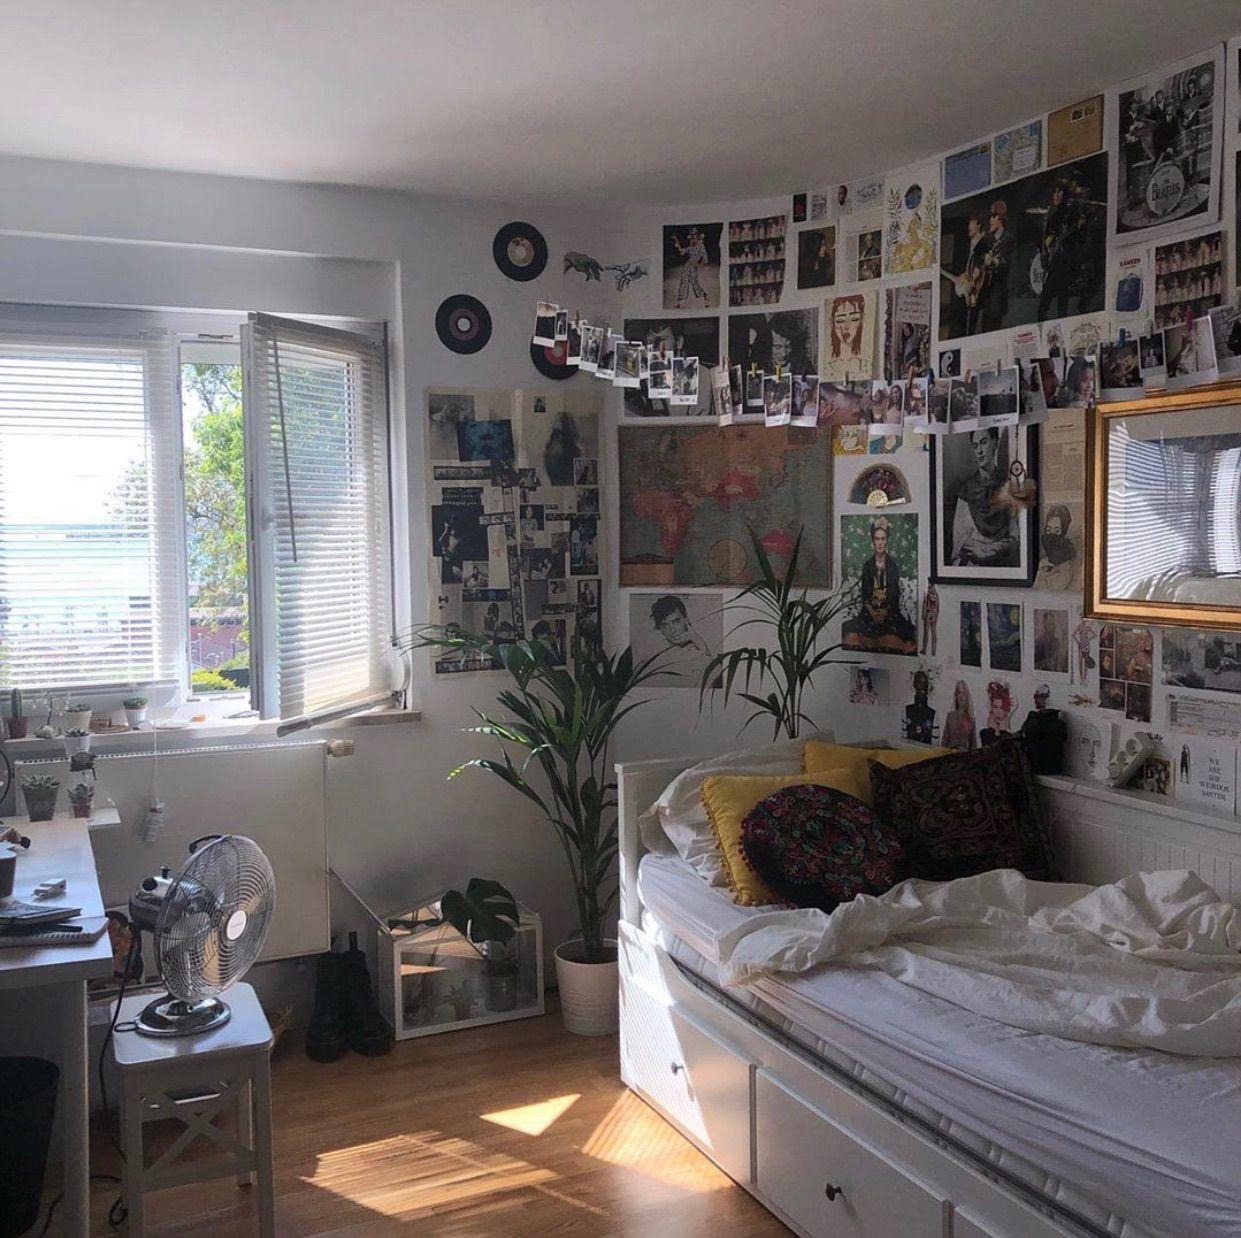 November 21 2019 At 06 51am In 2020 Retro Bedrooms Aesthetic Bedroom Room Inspo